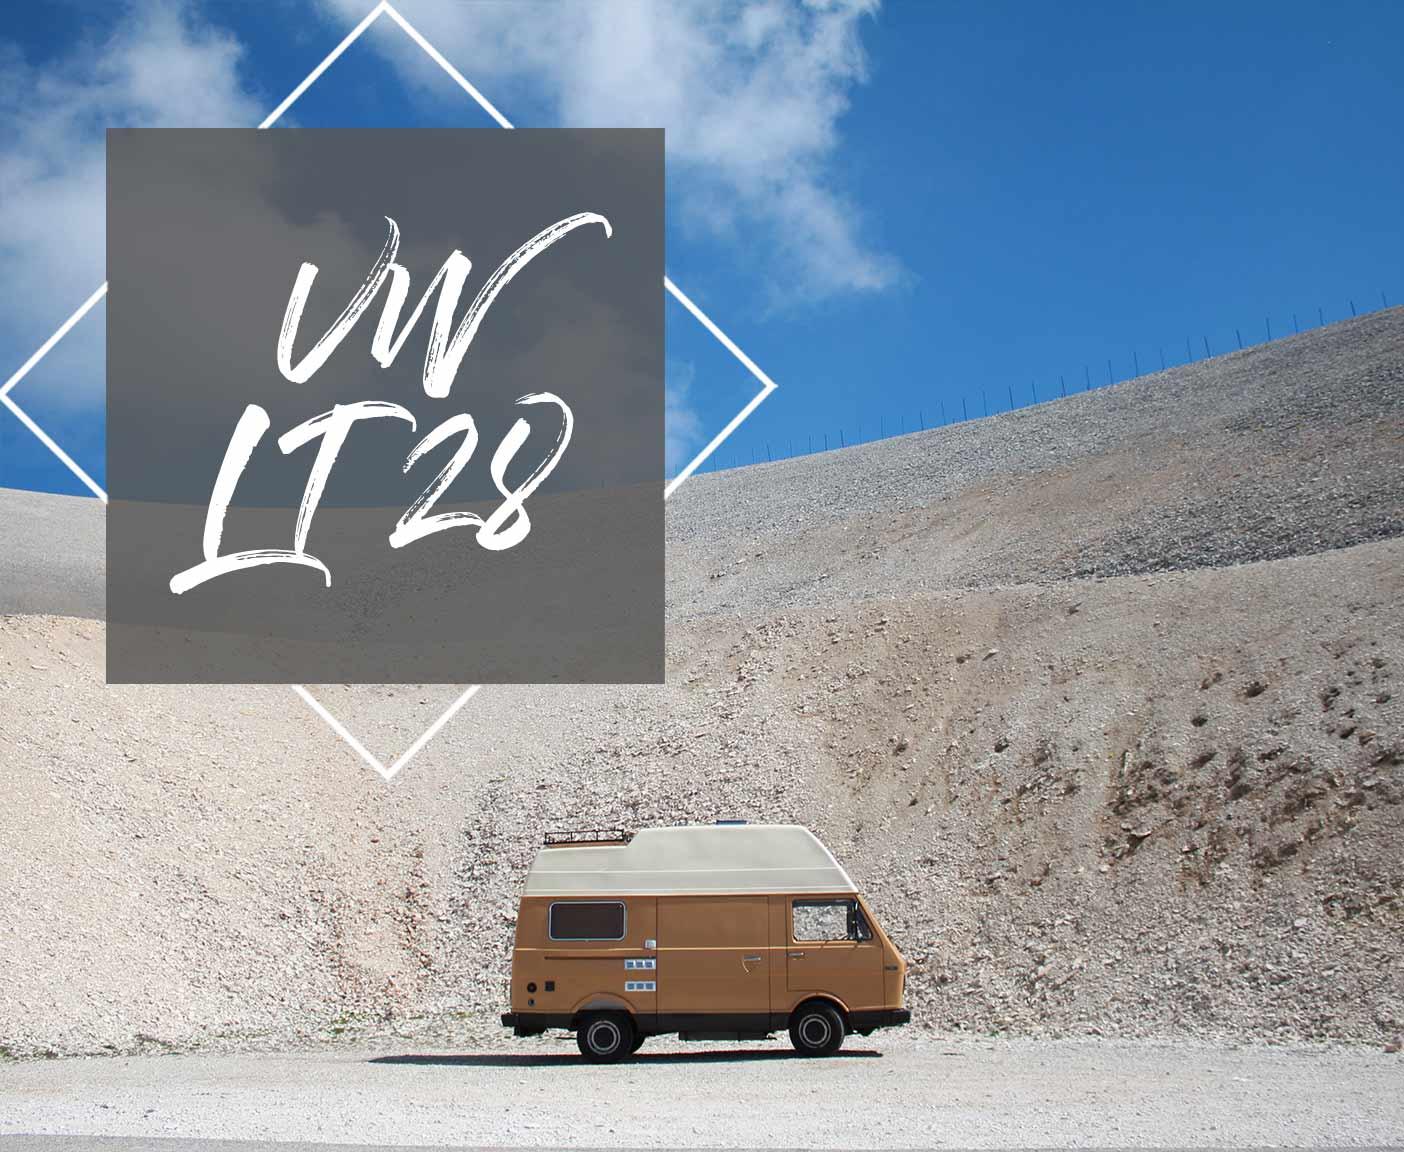 vw-lt-28-florida-hochdach-sven-hedin-wohnmobil-van